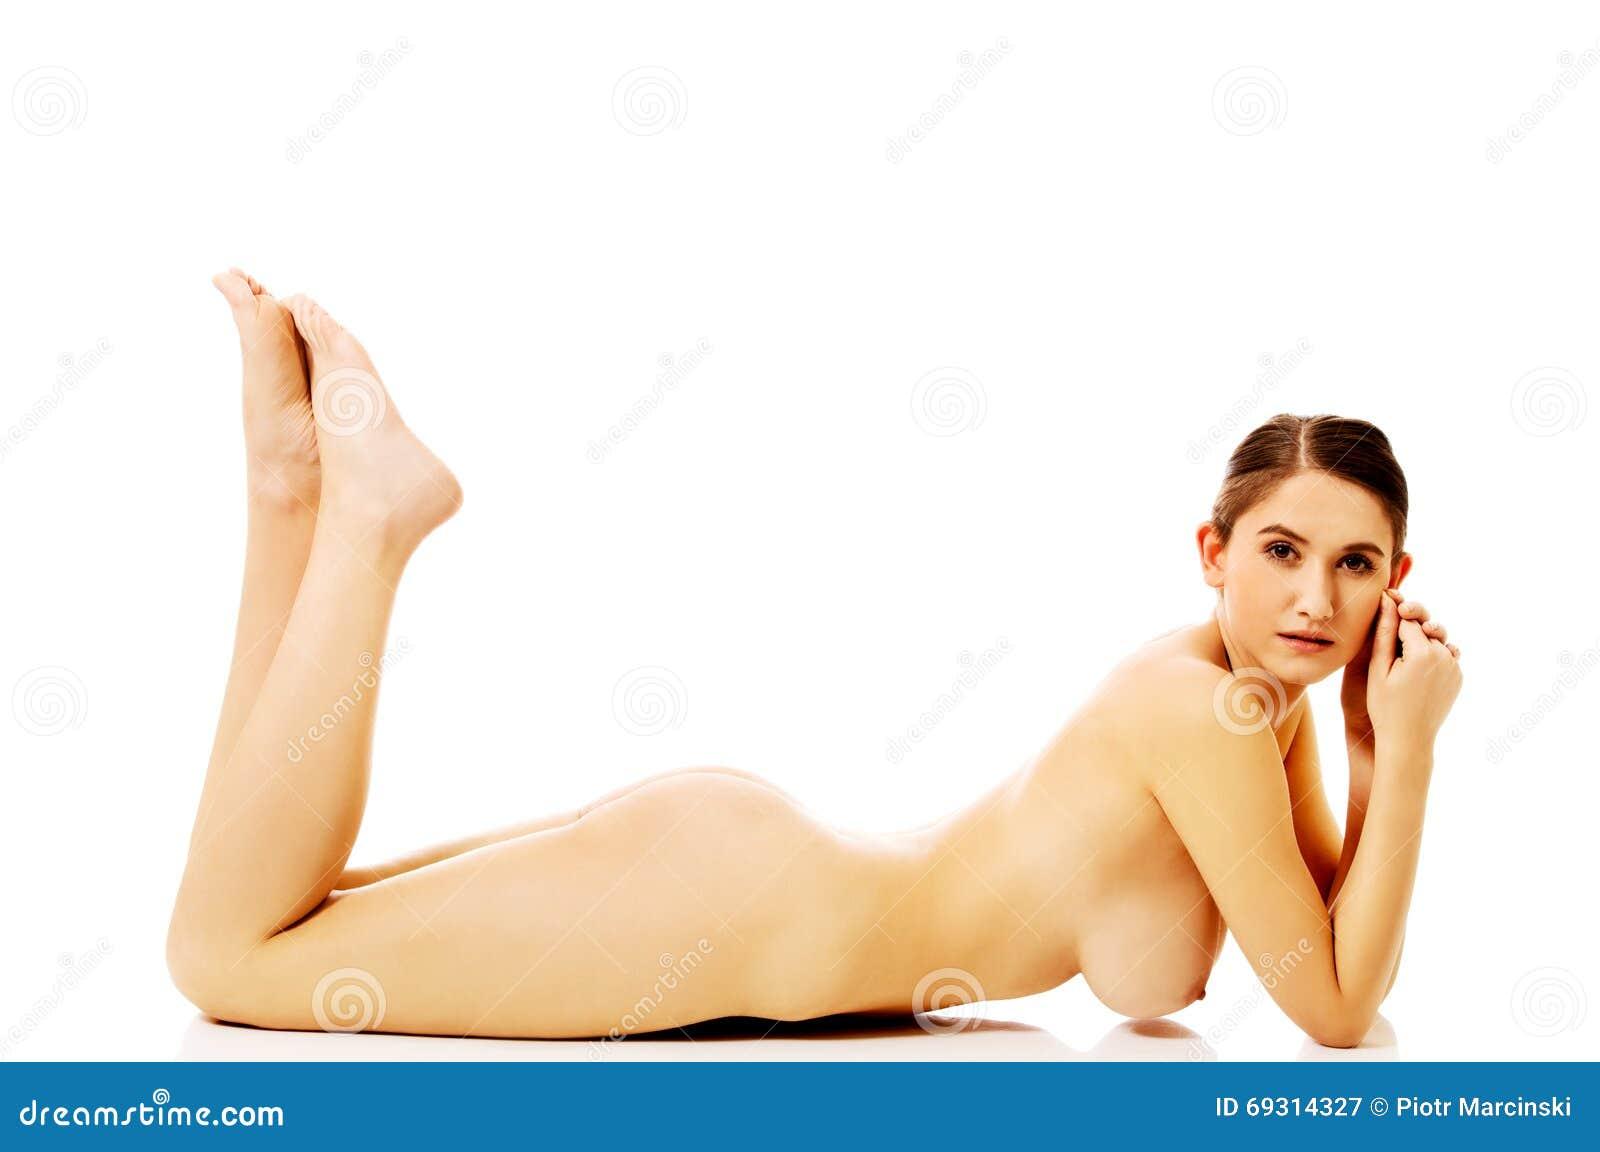 Greta rolf nude public